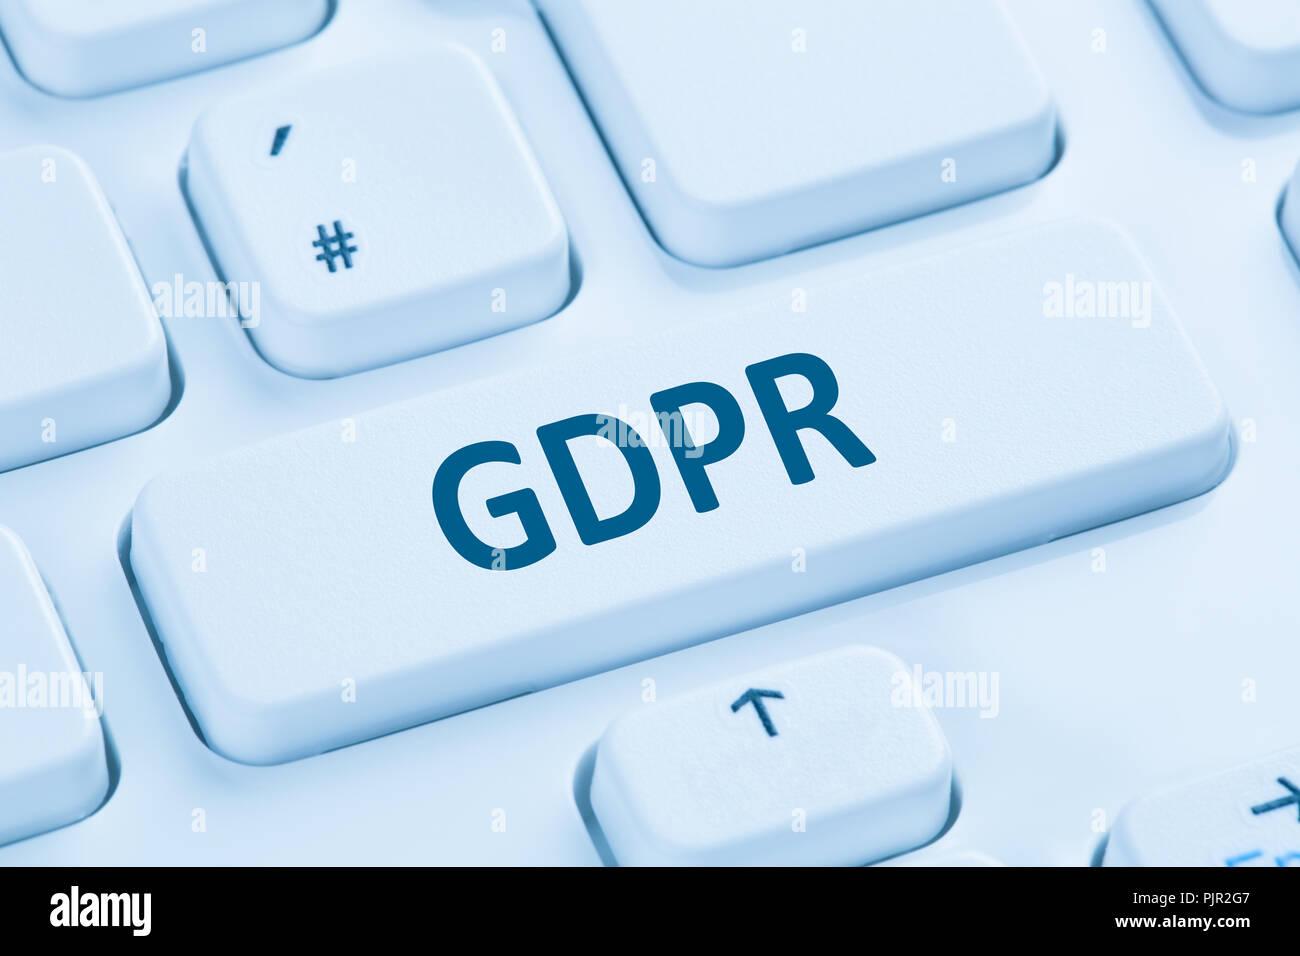 GDPR General Data Protection Regulation EU European Union websites internet blue computer keyboard symbol - Stock Image